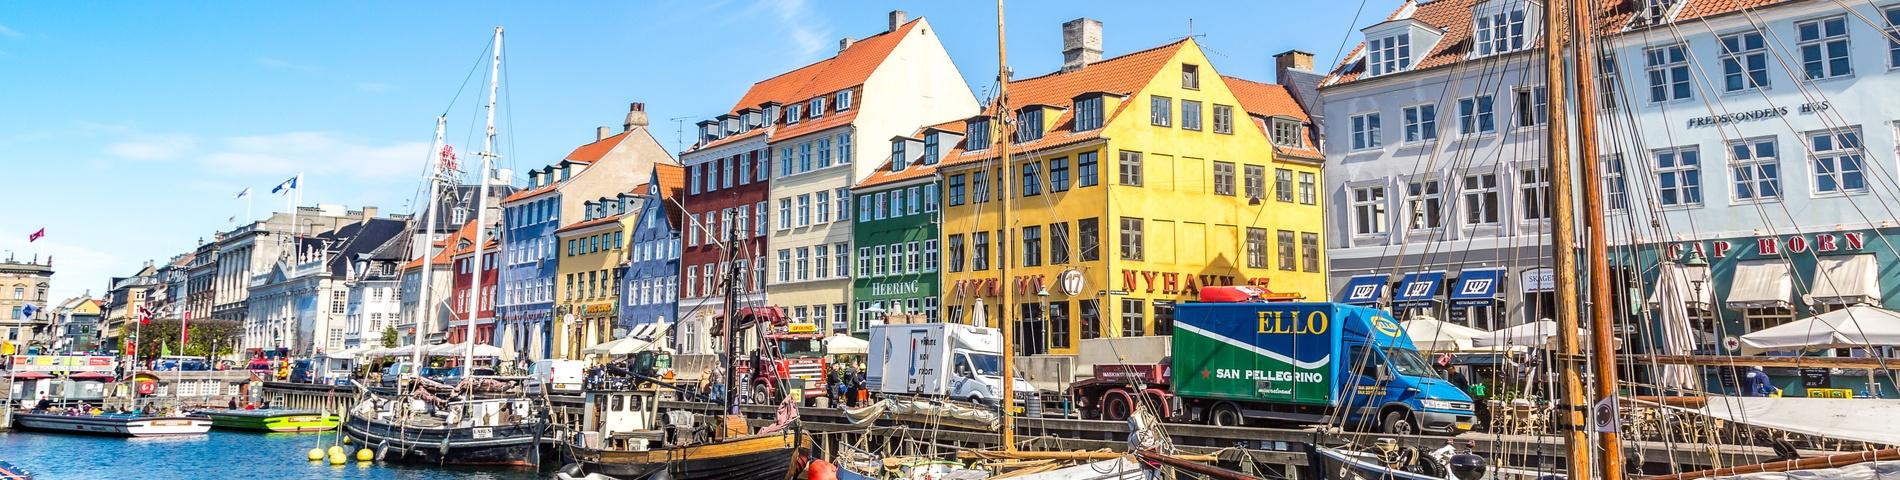 Top sprachschulen in kopenhagen d nischkurse sprachreisen for Kopenhagen unterkunft